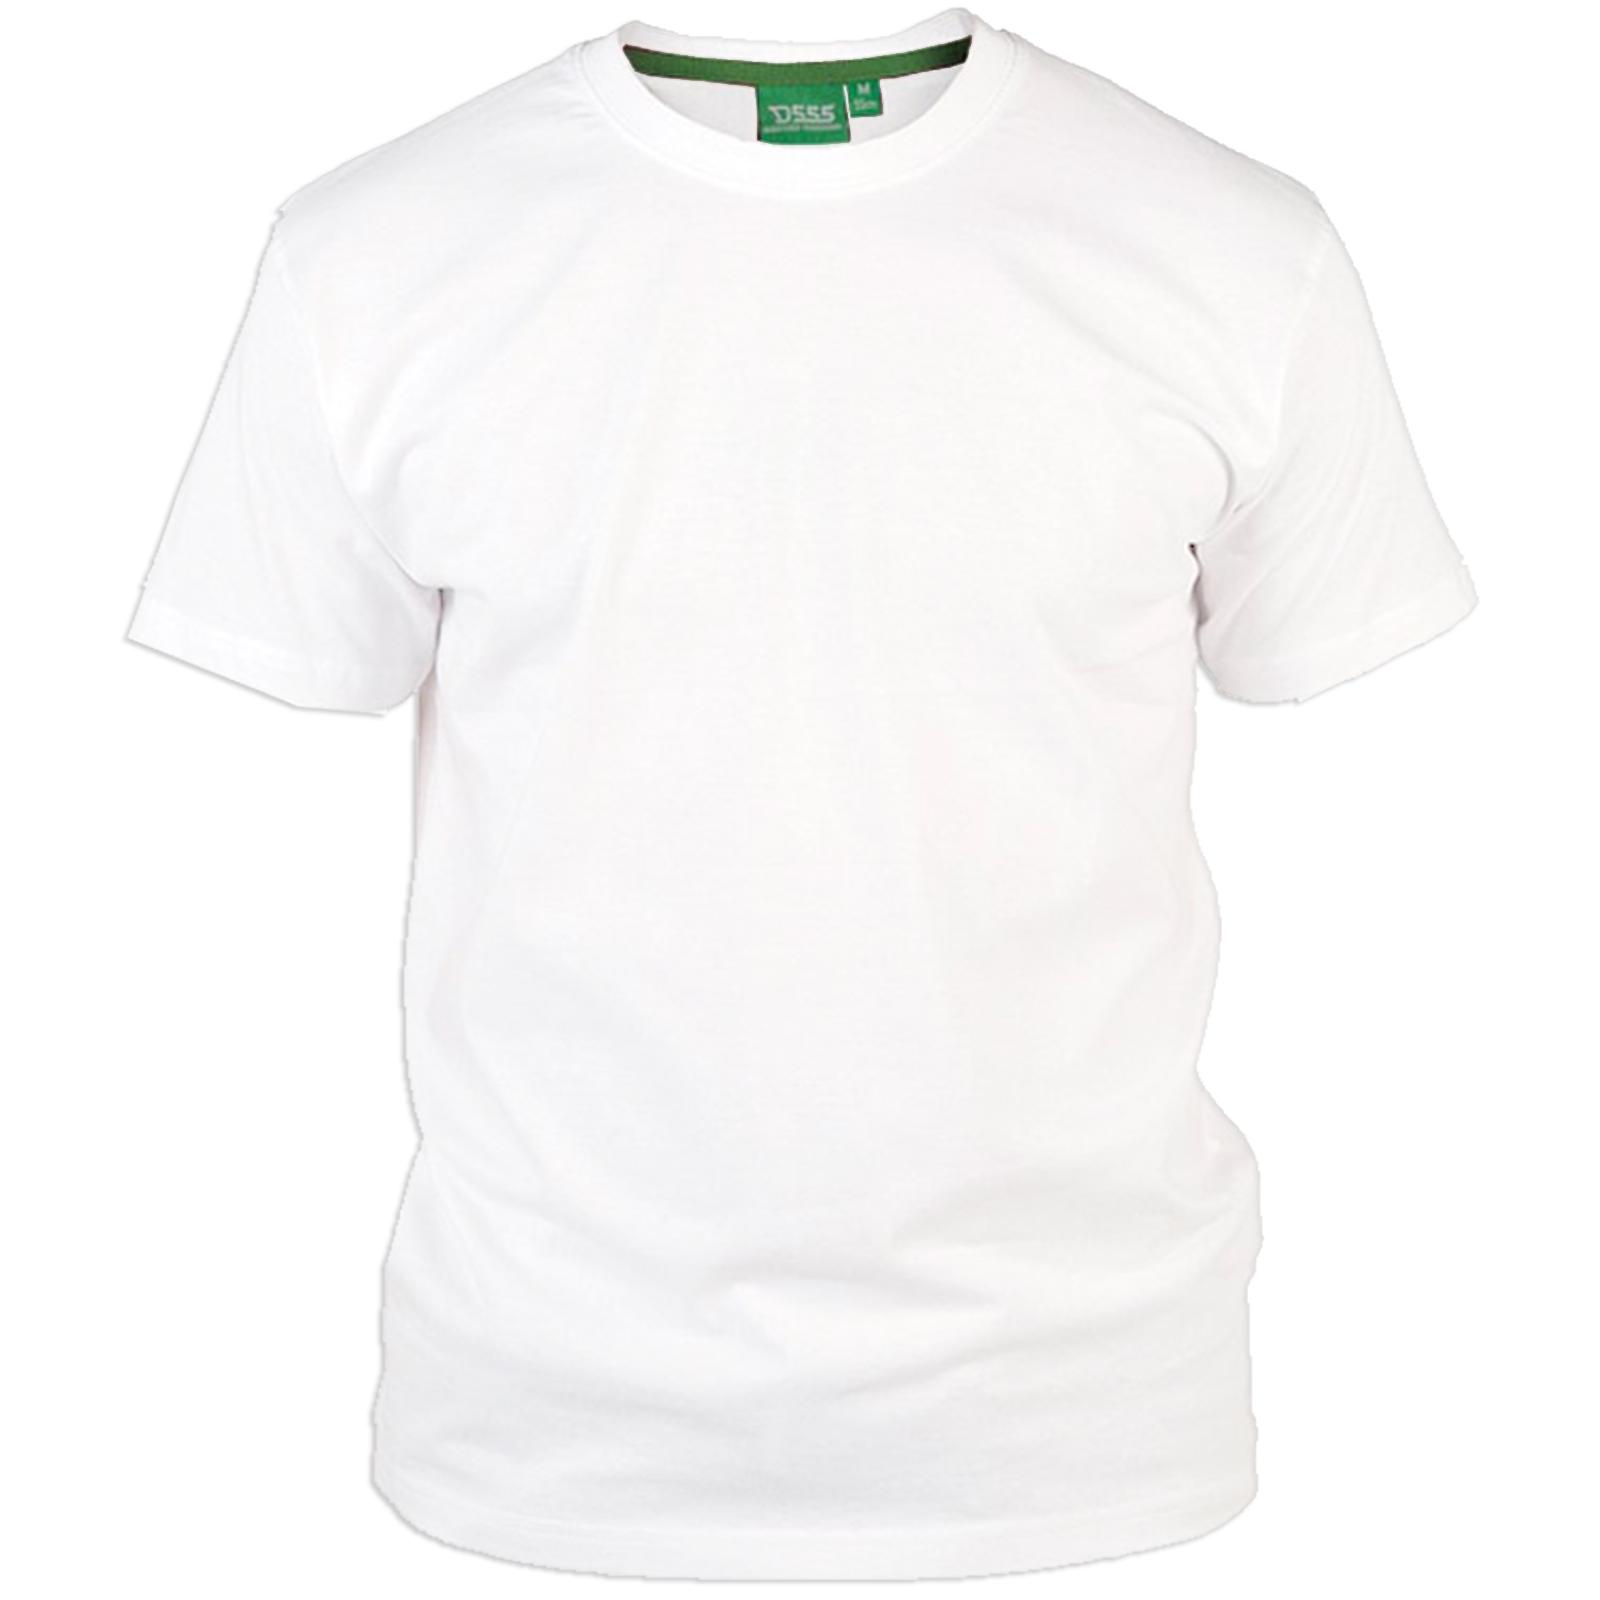 D555 Premium T-shirt